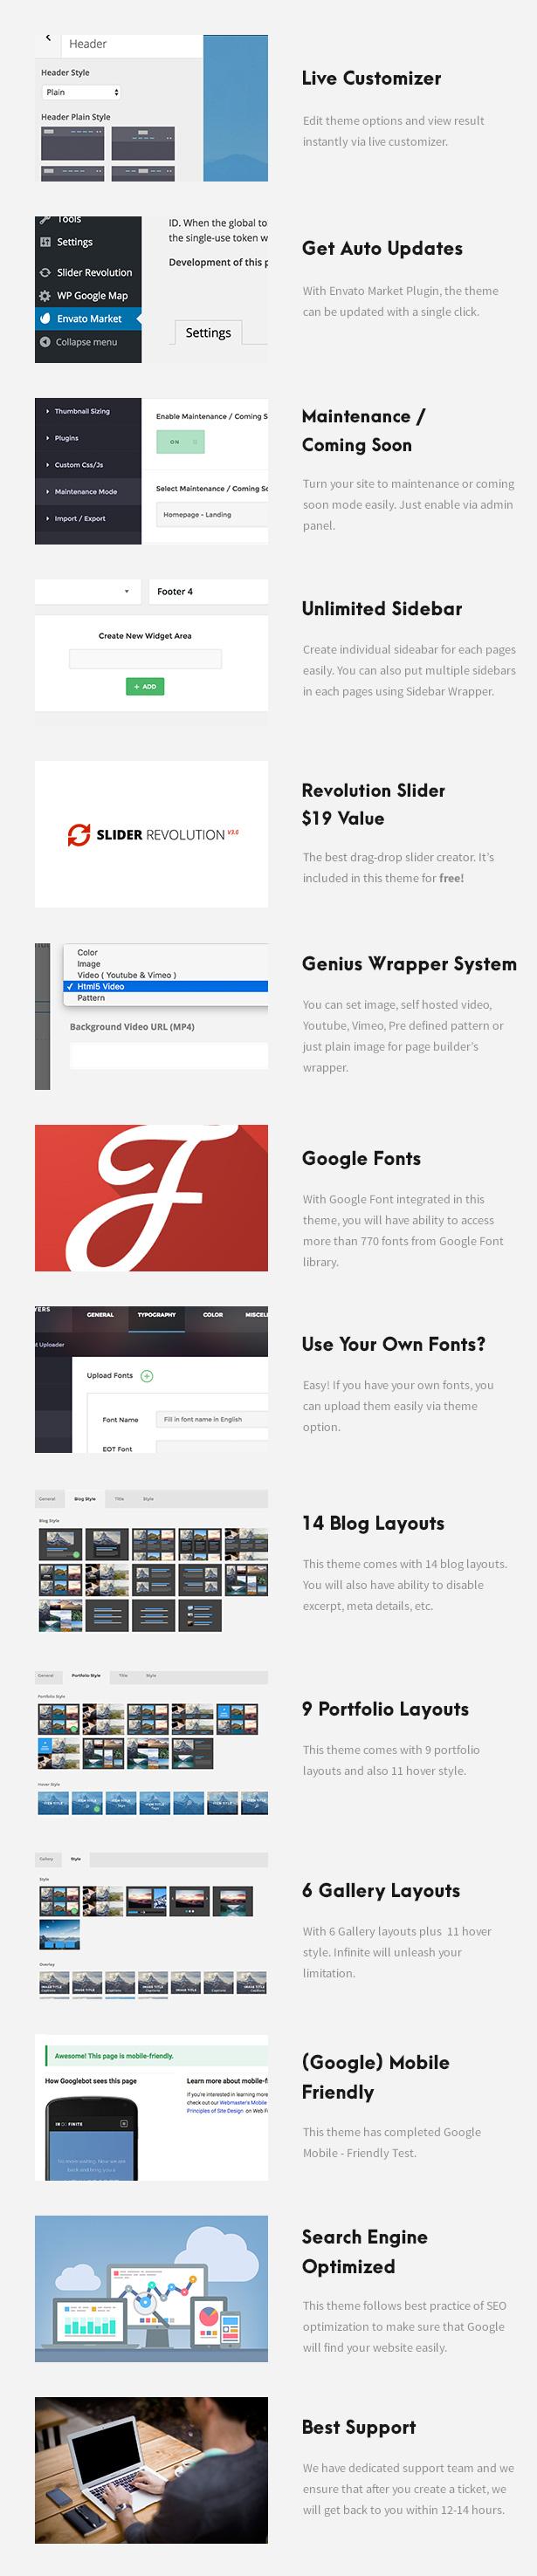 Kleanity - Minimalist WordPress Theme / Creative Portfolio - 10